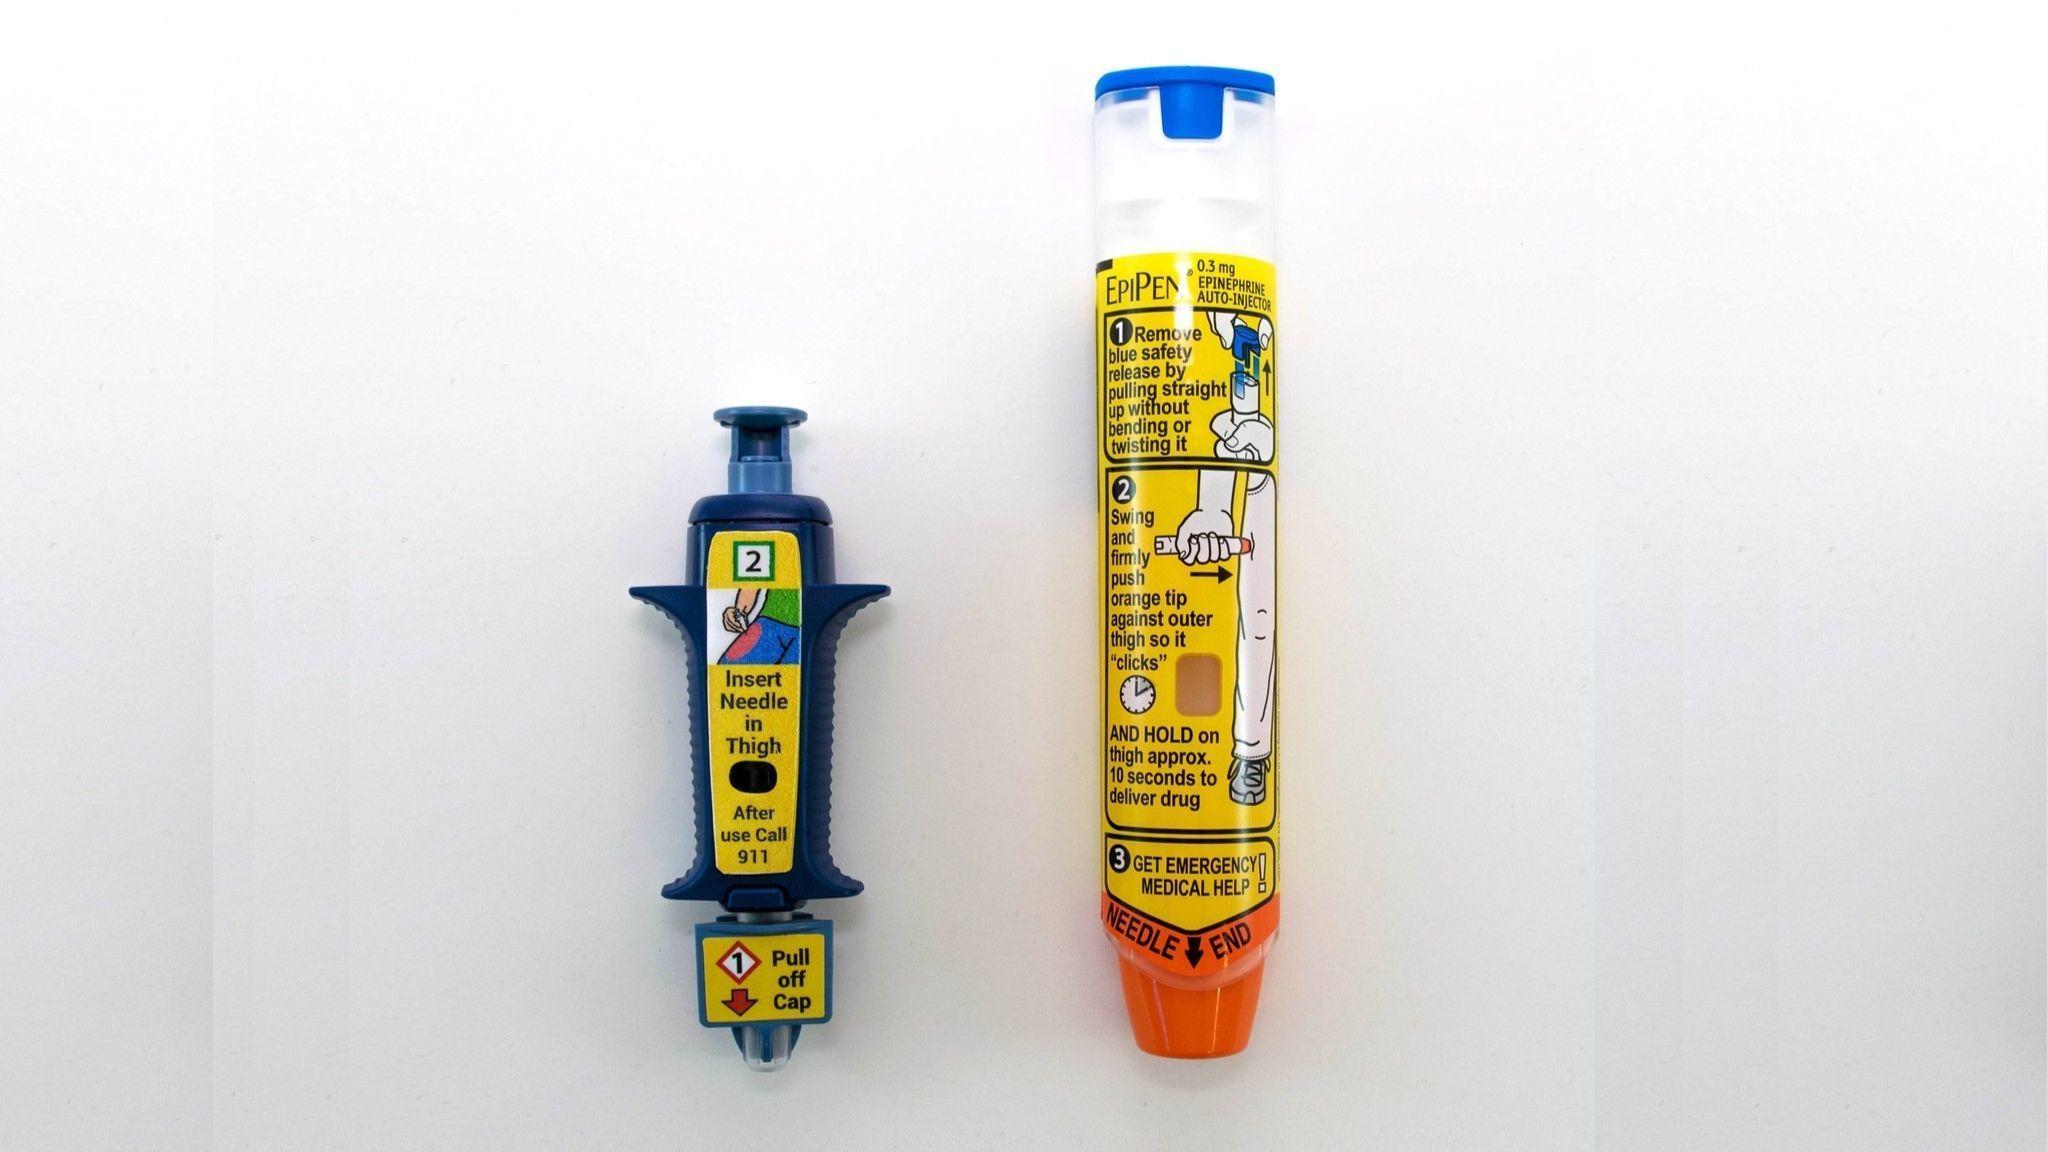 EpiPen rival from San Diego's Adamis nears market | San Diego Union Tribune